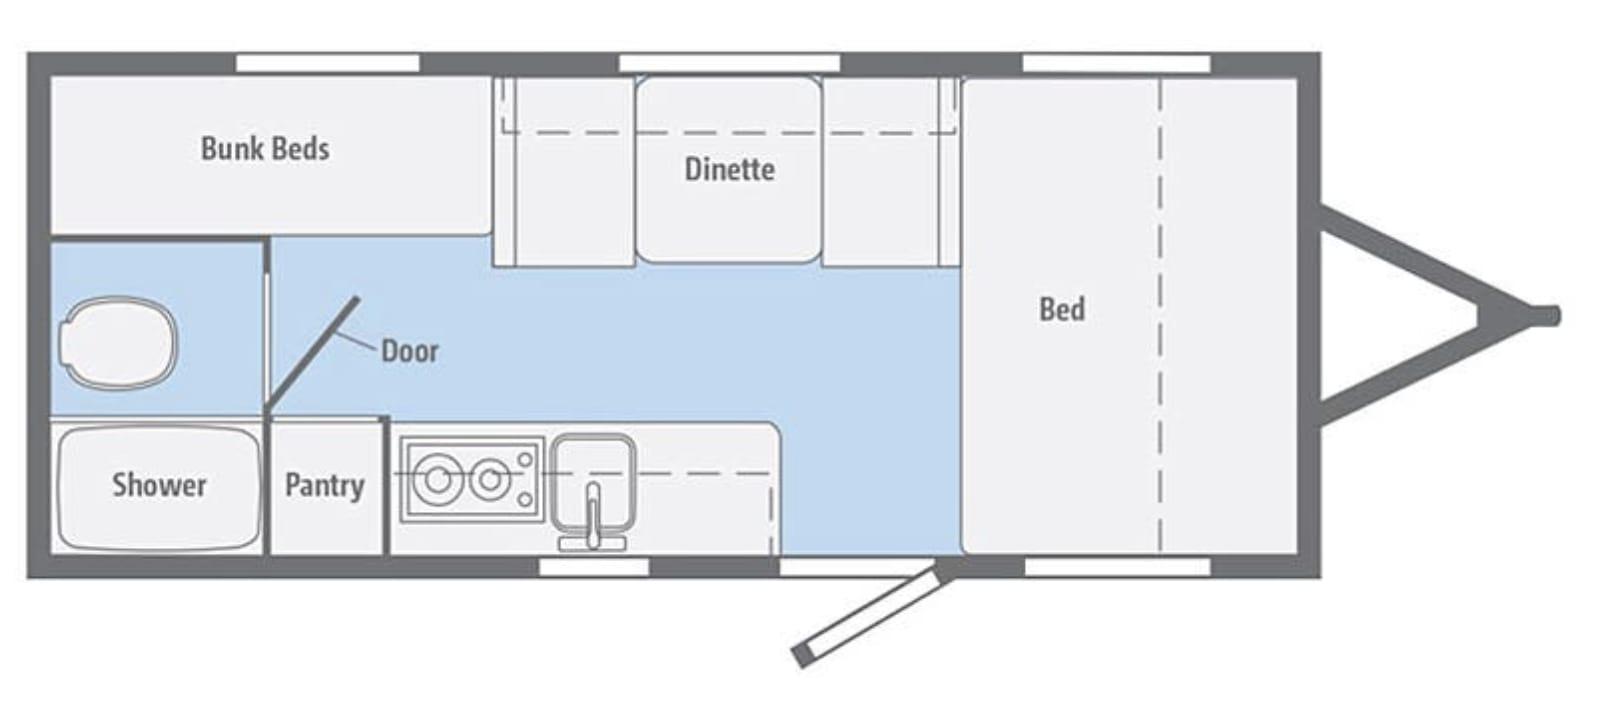 Micro Mini 2019 1700BH Floor Plan. Winnebago Micro Minnie 2019